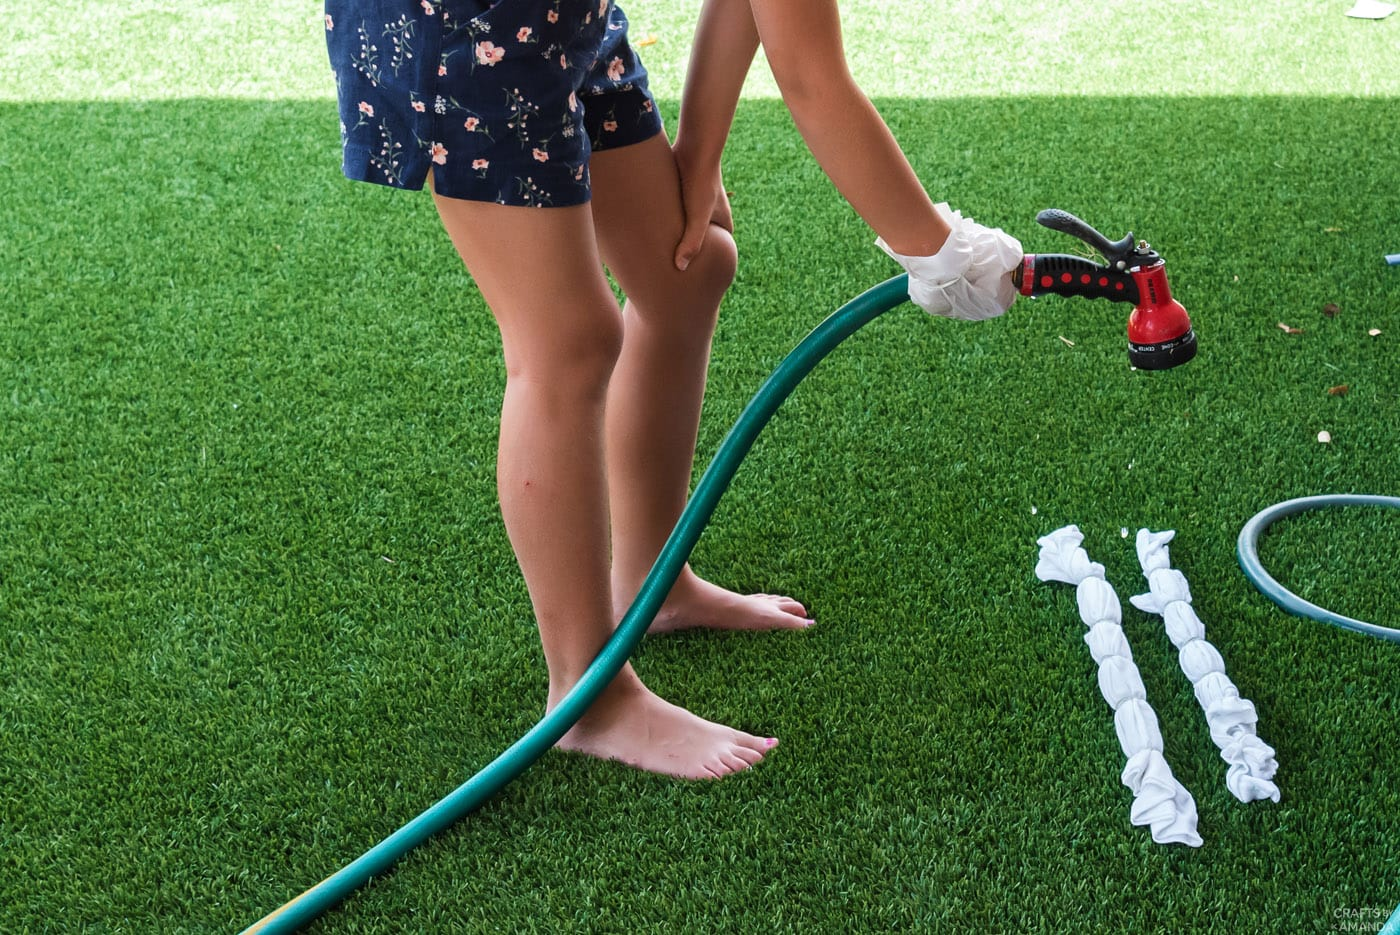 girl using a hose to wet a shirt